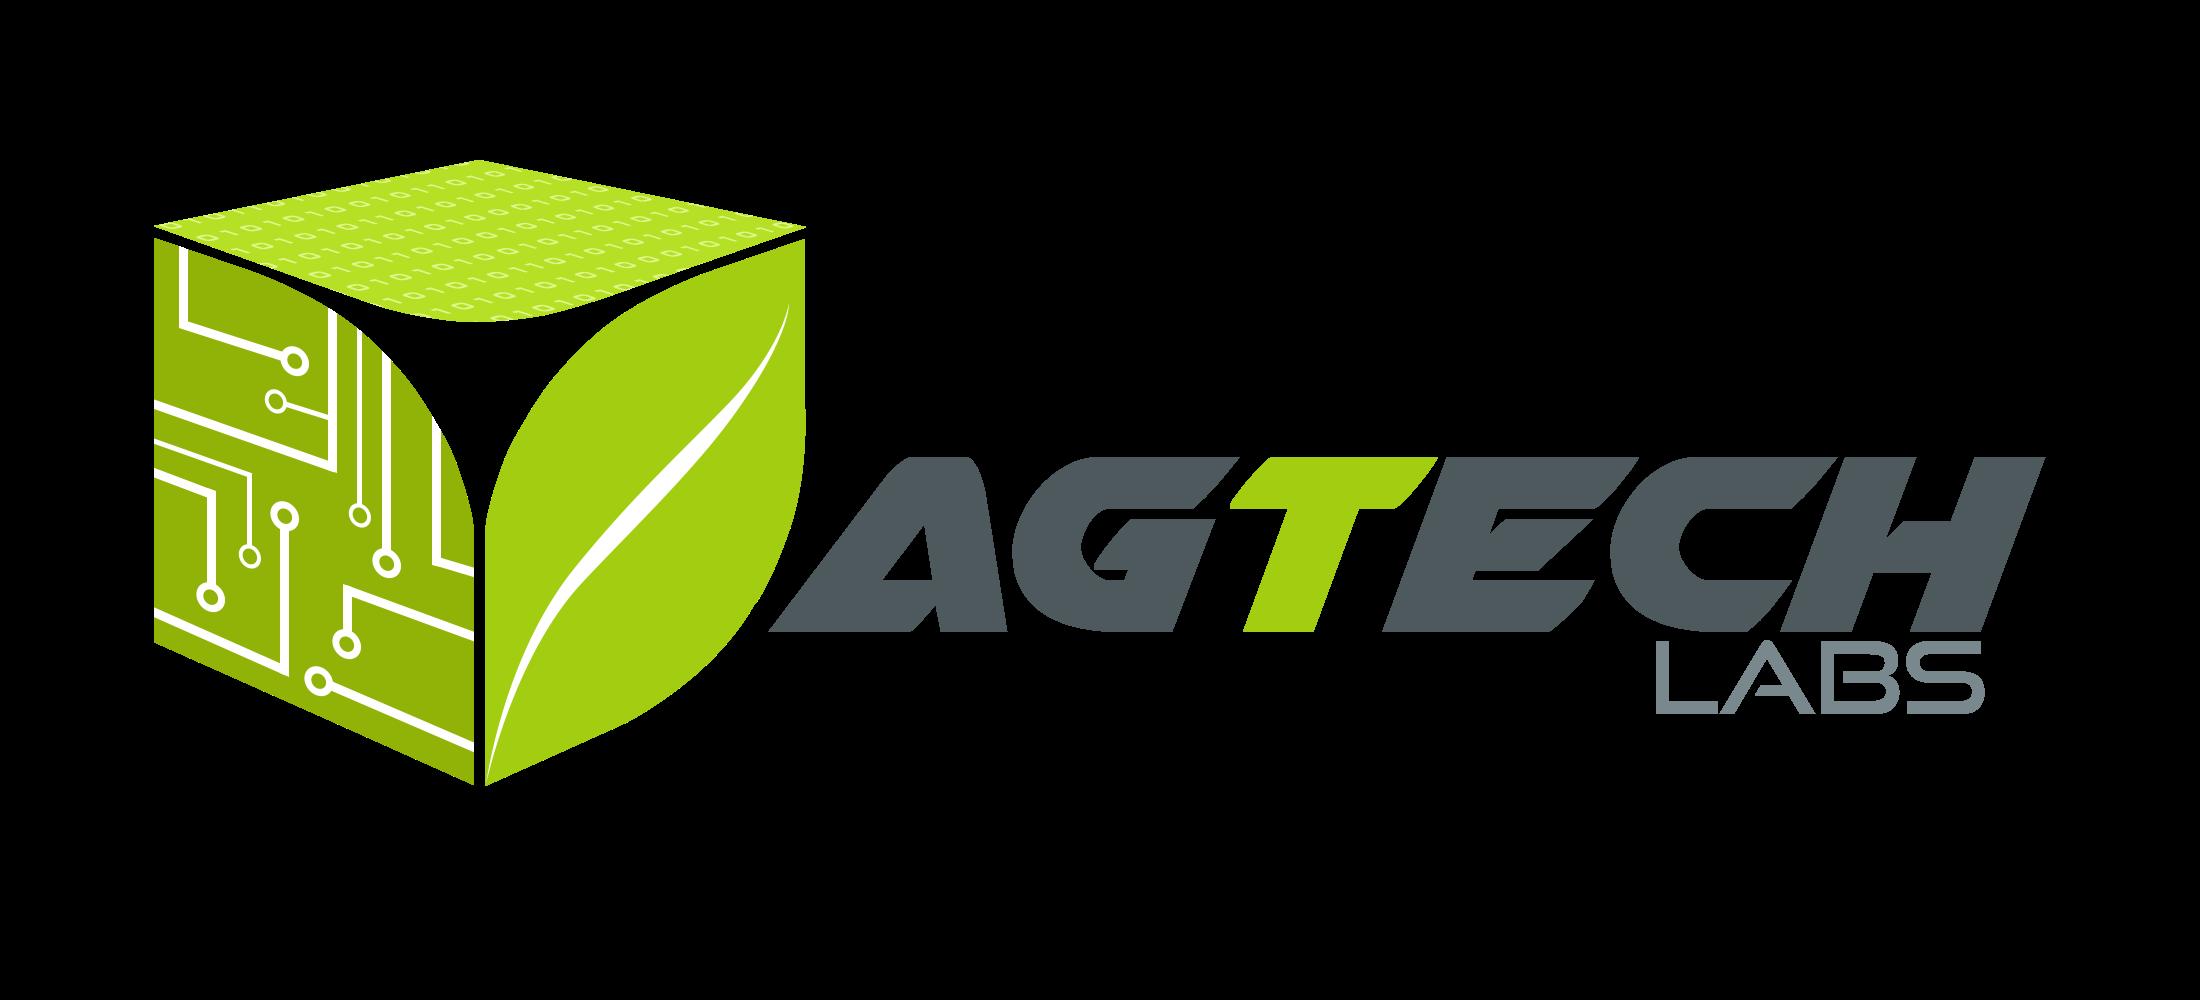 Agtech Labs, Inc.